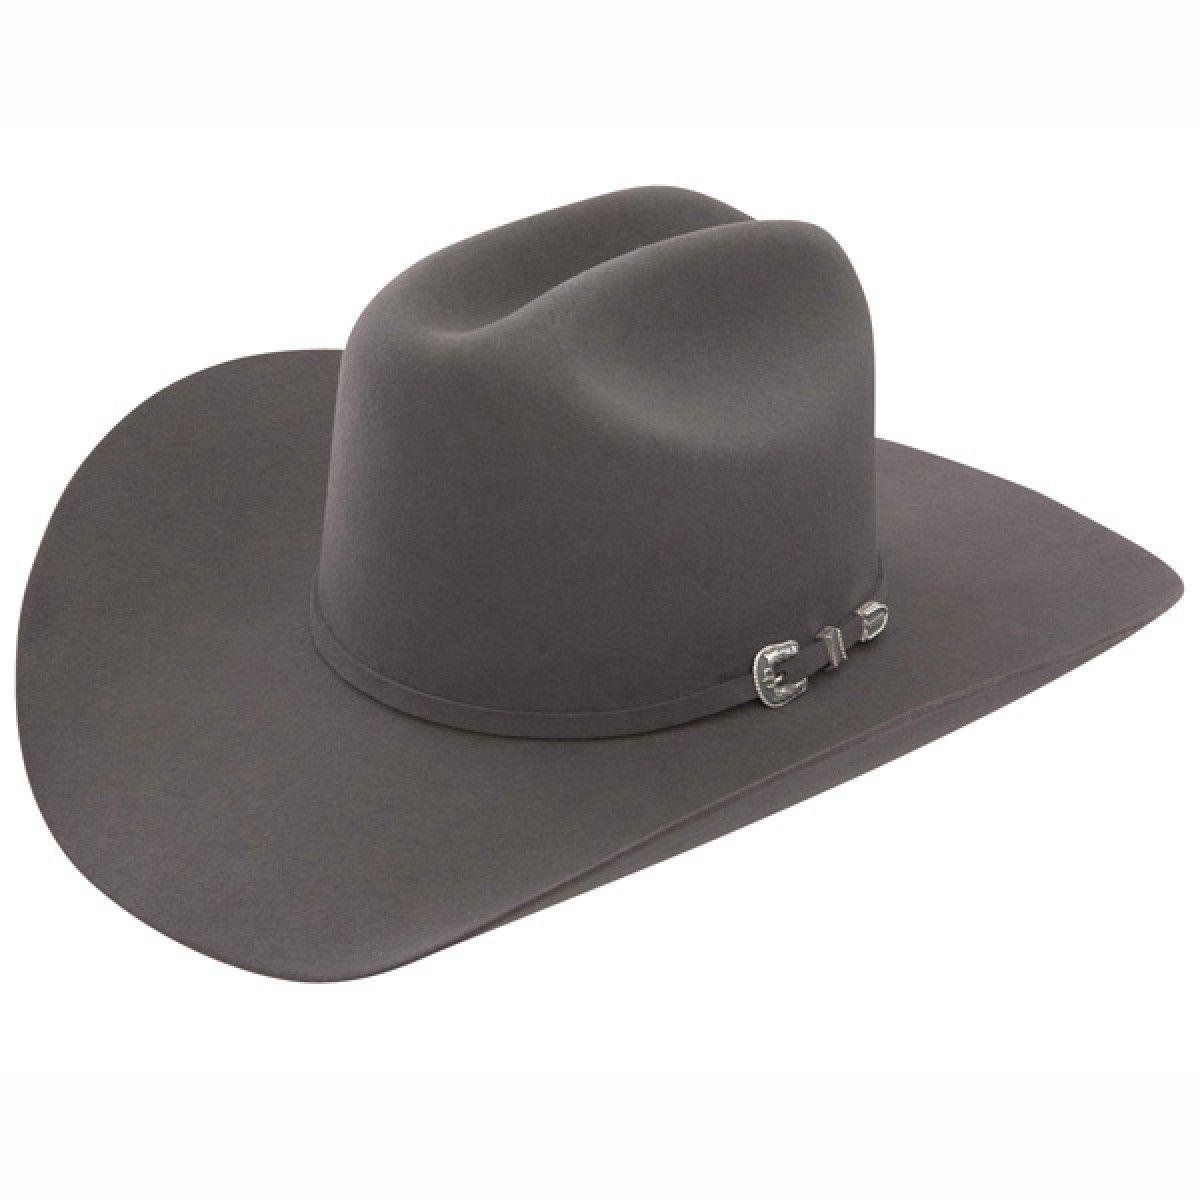 b0ed825dbdf Stetson skyline fur cowboy hat the skyline jpg 1200x1200 Felt cowboy hats  resistol tucker